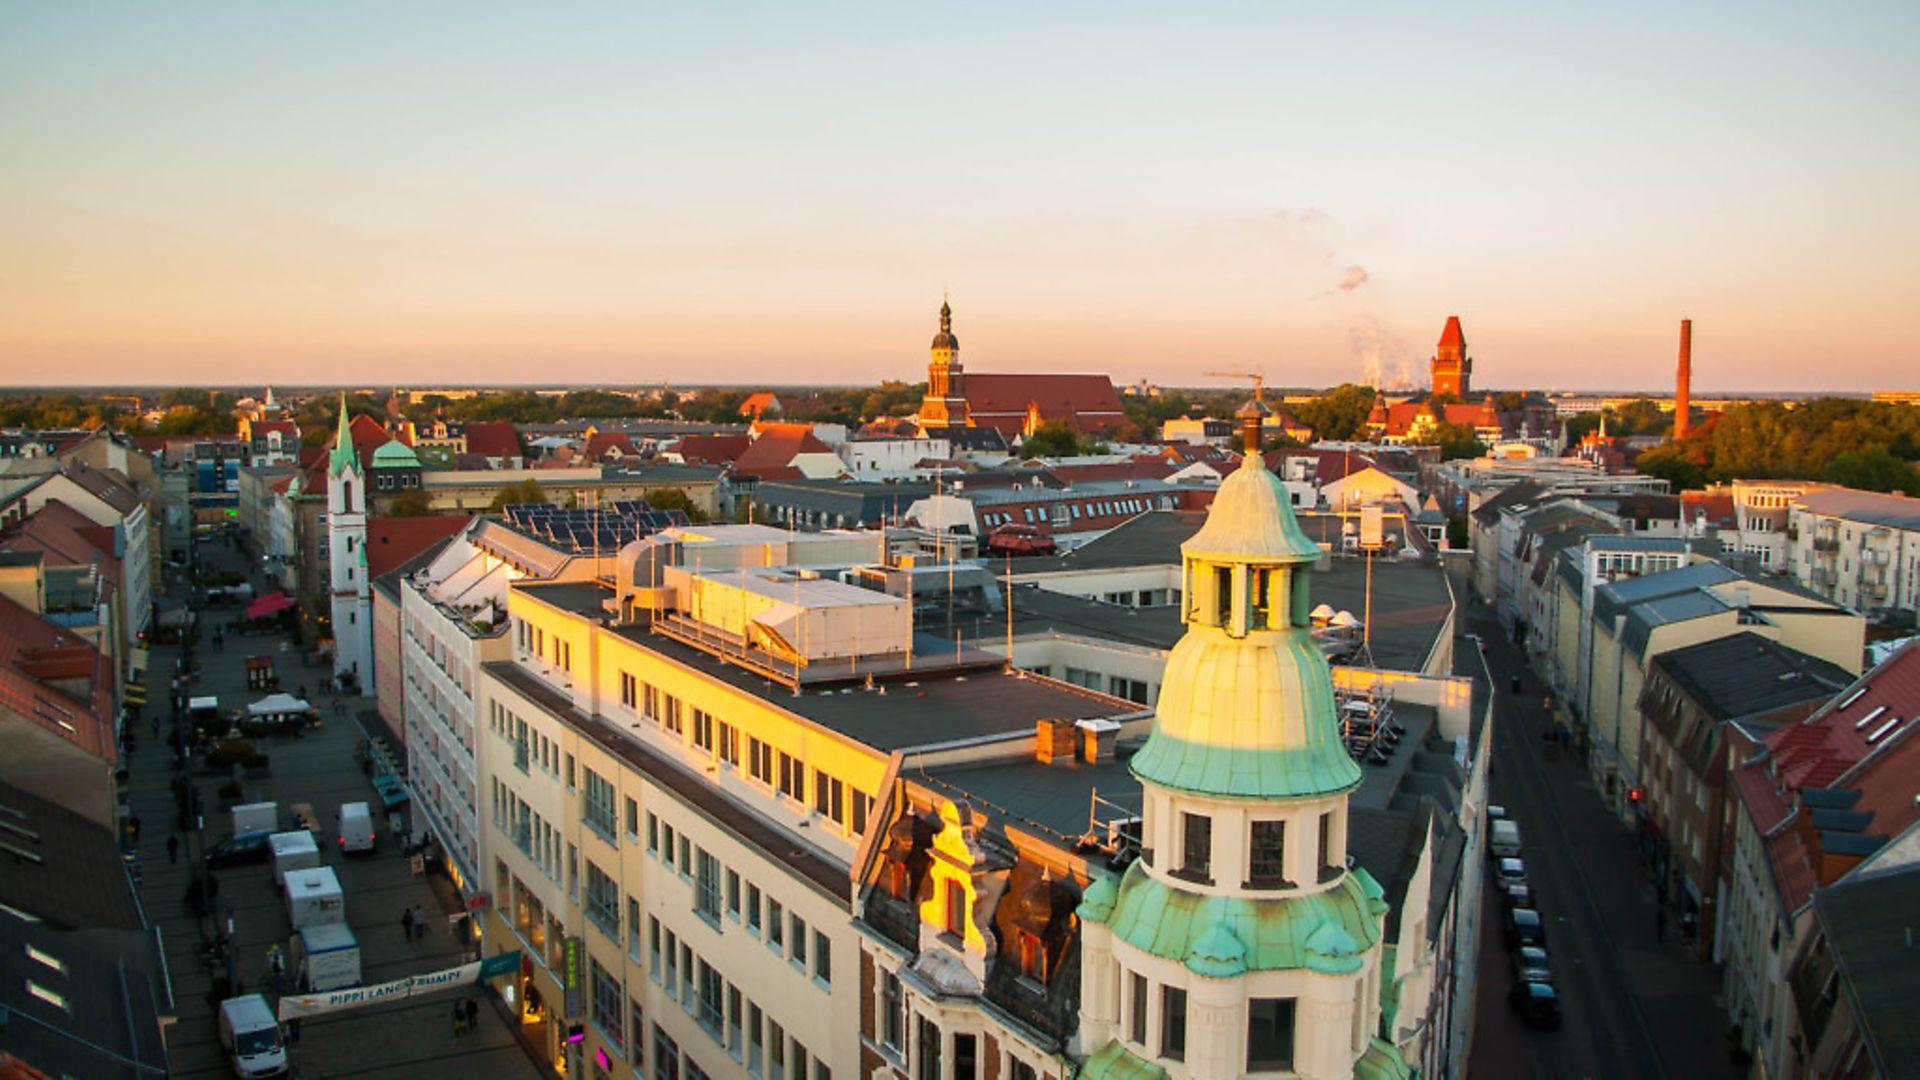 The view over the German city of Cottbus where Lower Sorbian is still spoken. Photo:Teodor Bordeianu - Credit: Teodor Bordeianu